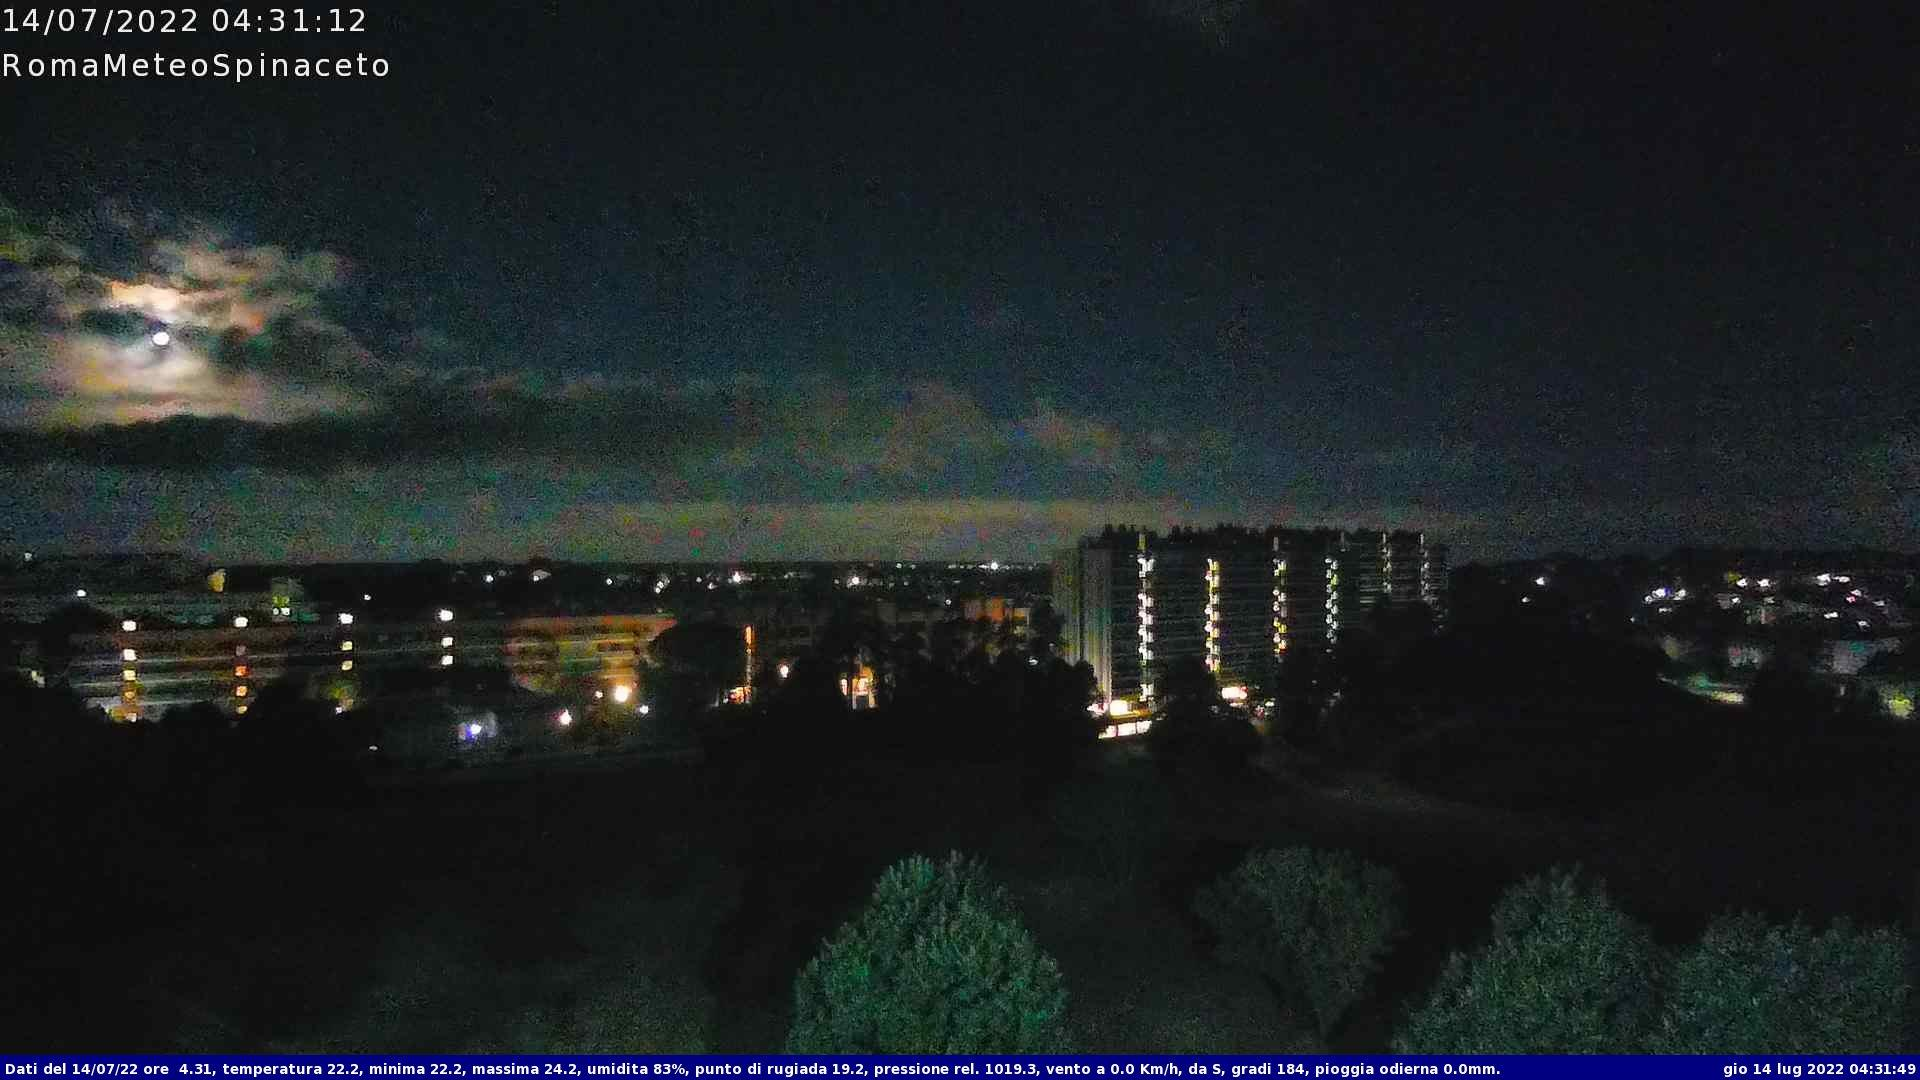 Webcam Rome › West: Castelfusano